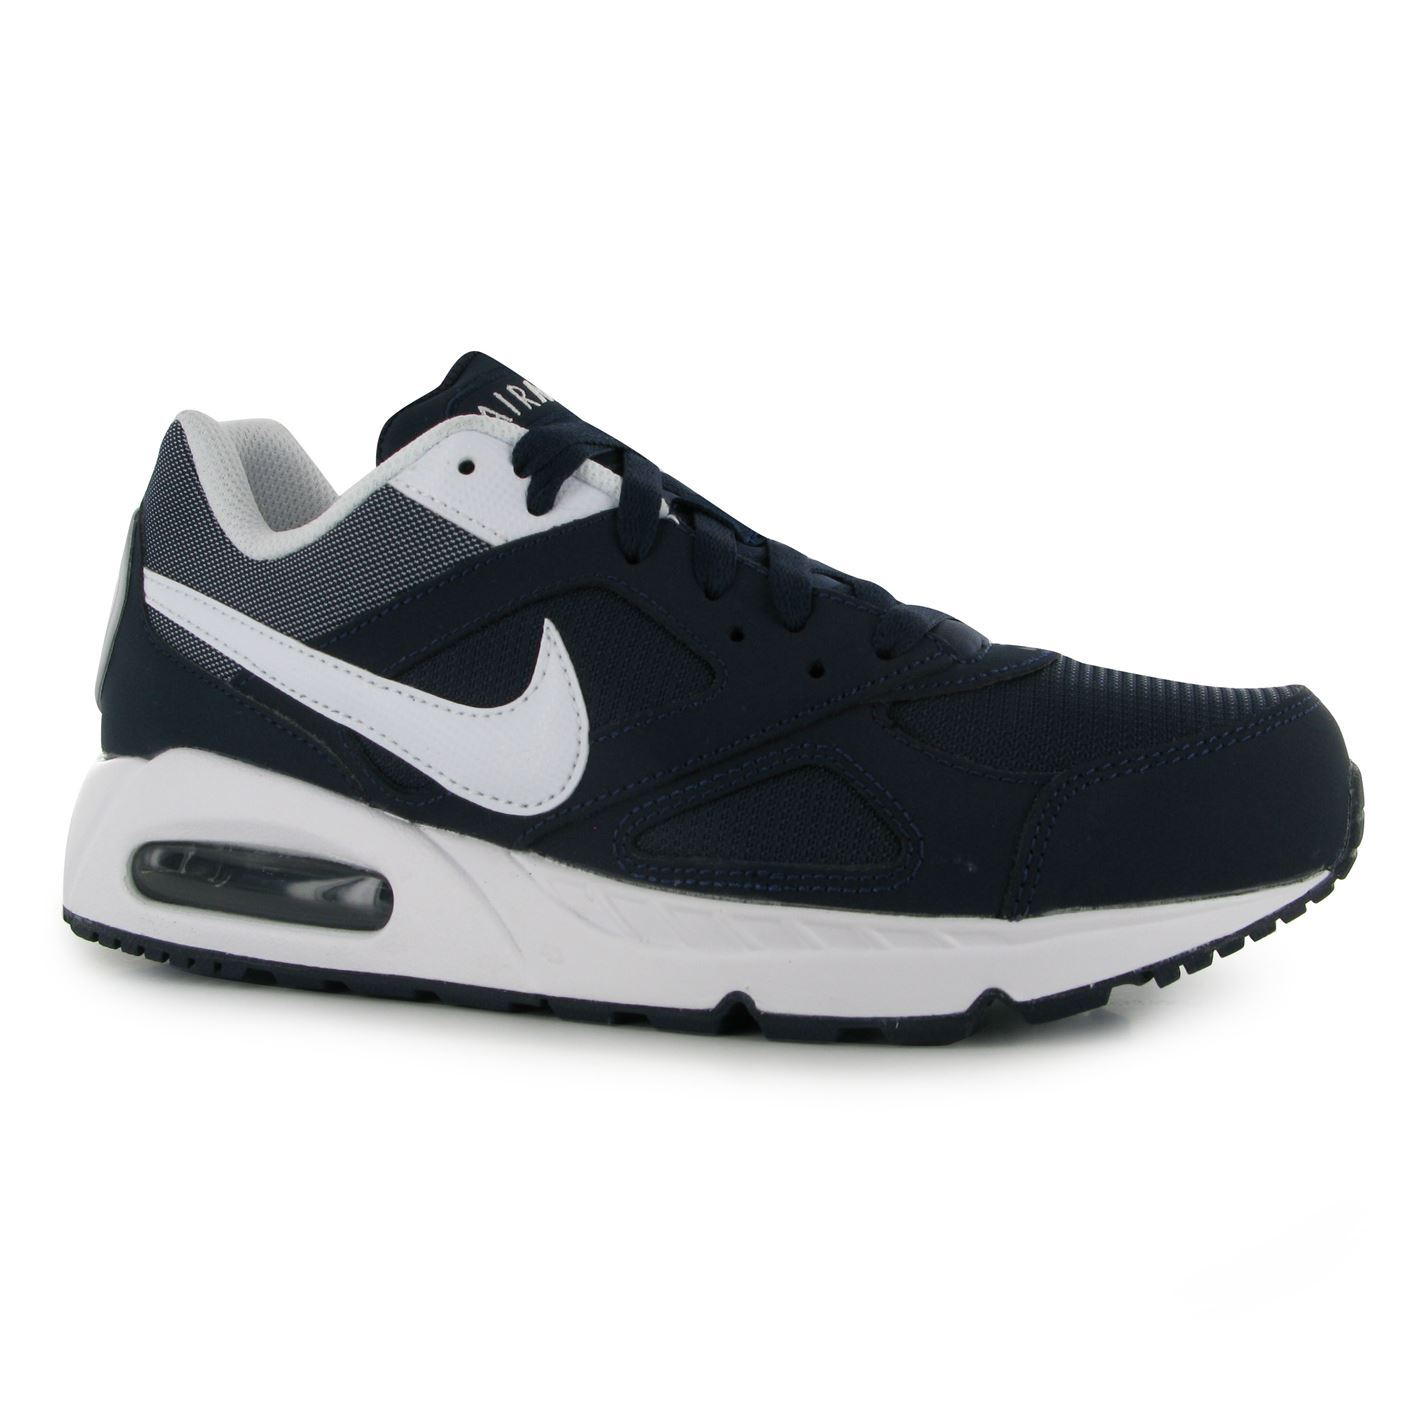 Jacamo Mens Shoes